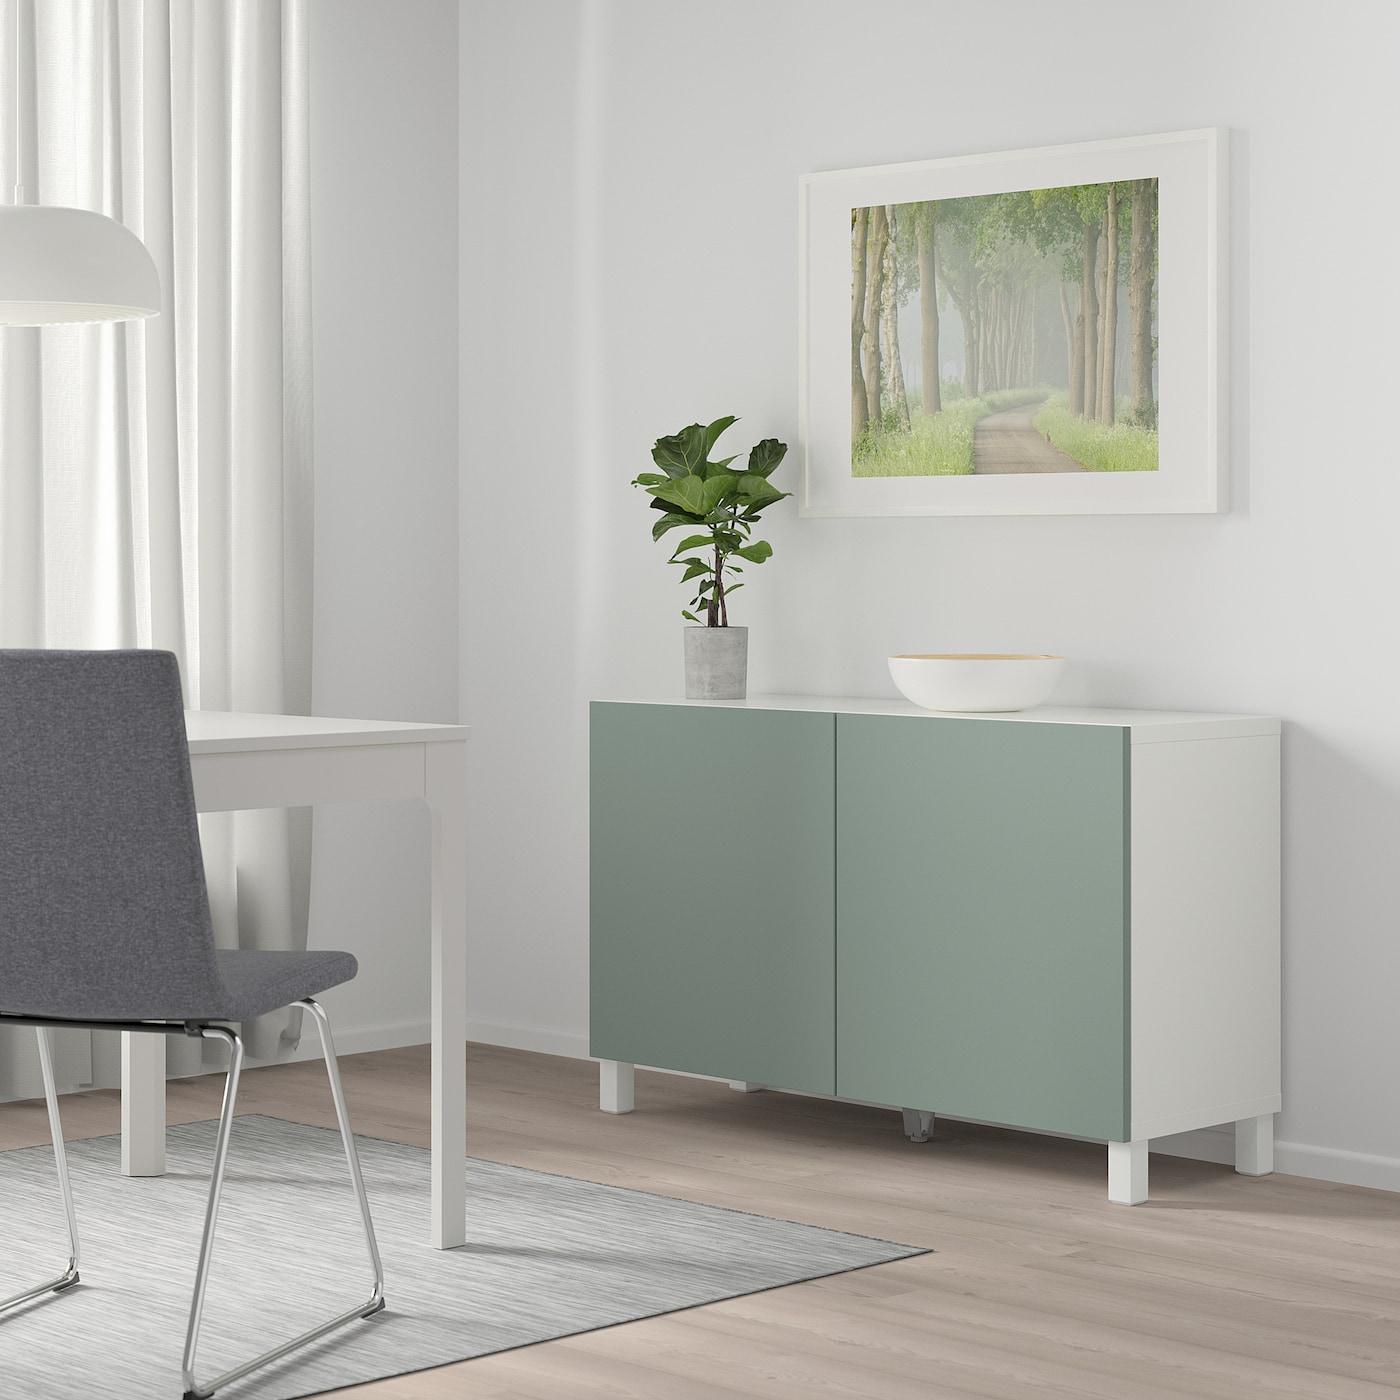 Meuble Ikea Besta Blanc bestÅ combinaison rangement portes - blanc, notviken/stubbarp gris vert  120x42x74 cm